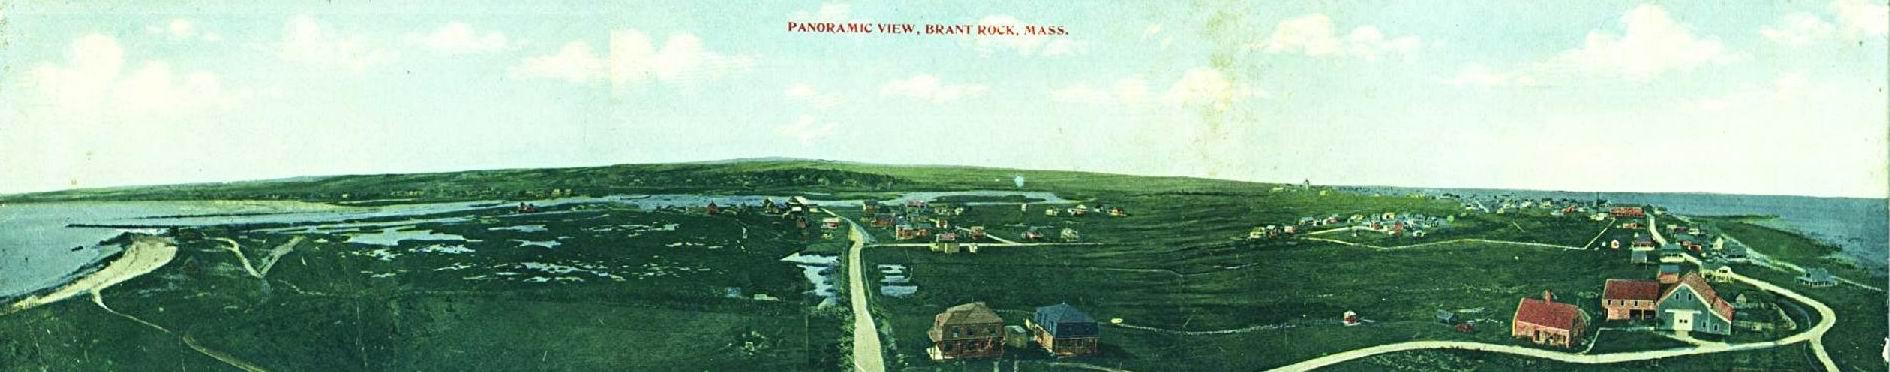 Brant Rock Panorama - A rare triple-fold postcard - No Date